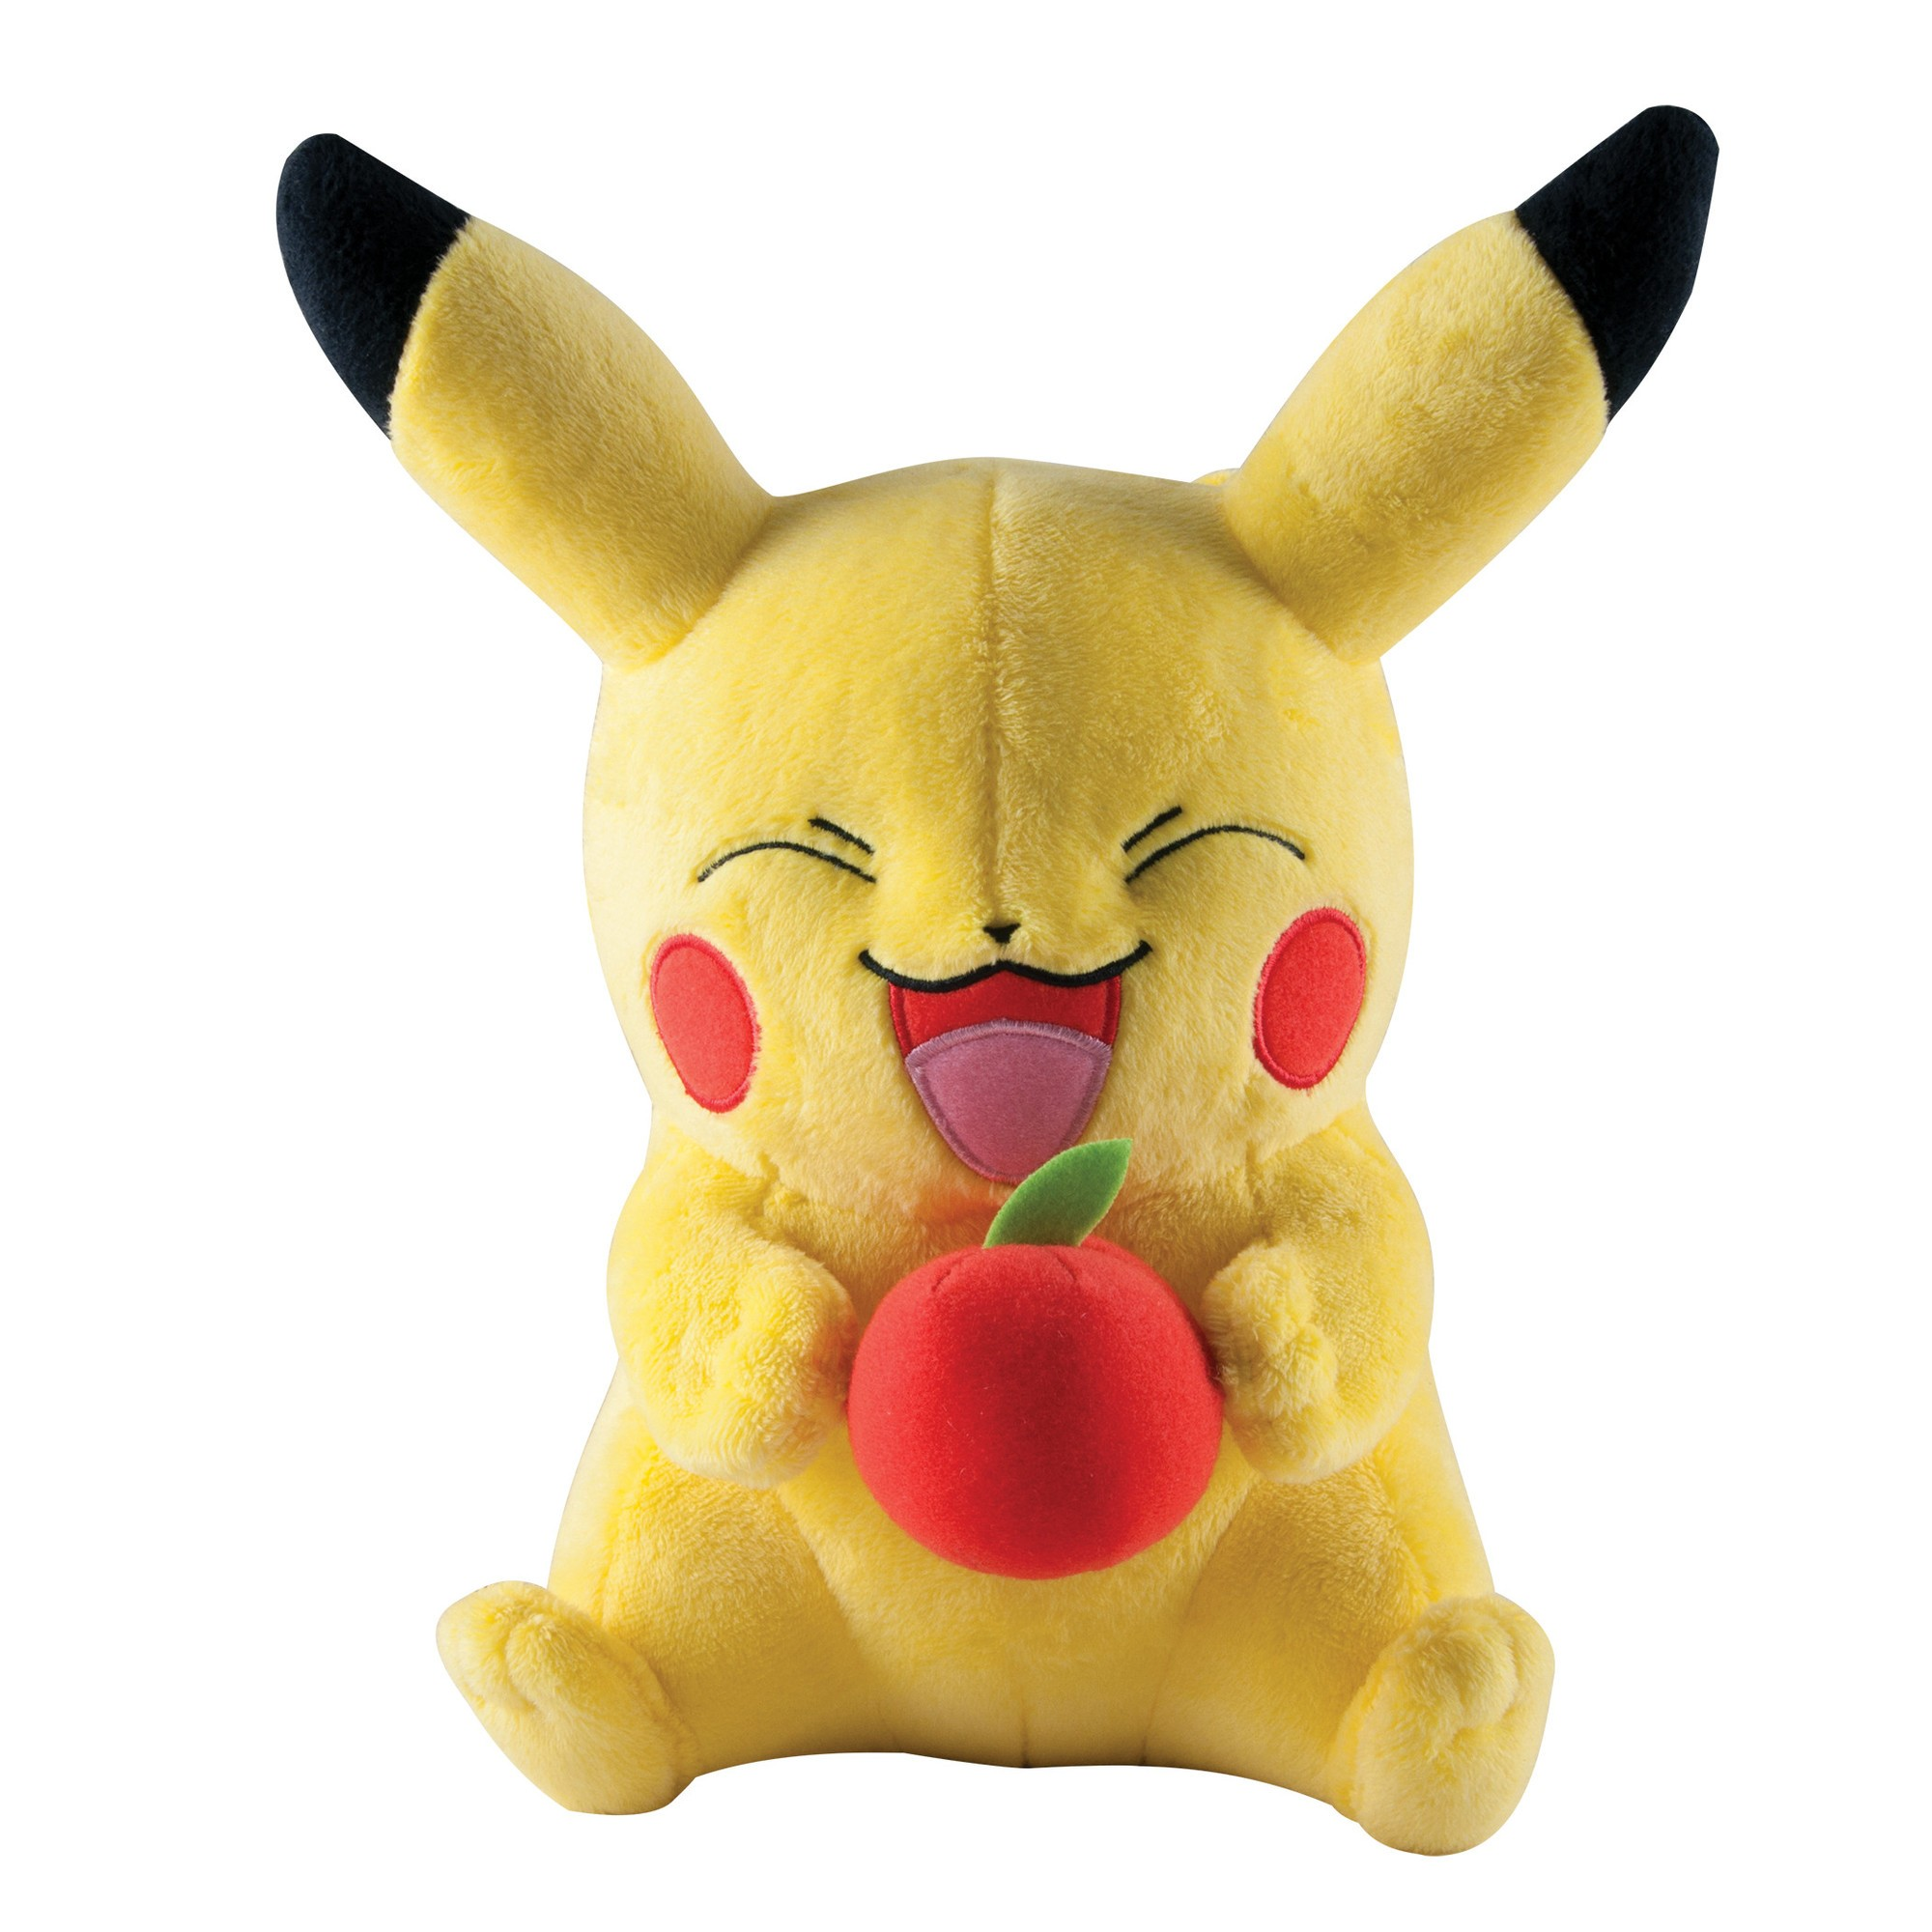 Pokemon Pikachu with Apple Plush (26cm)